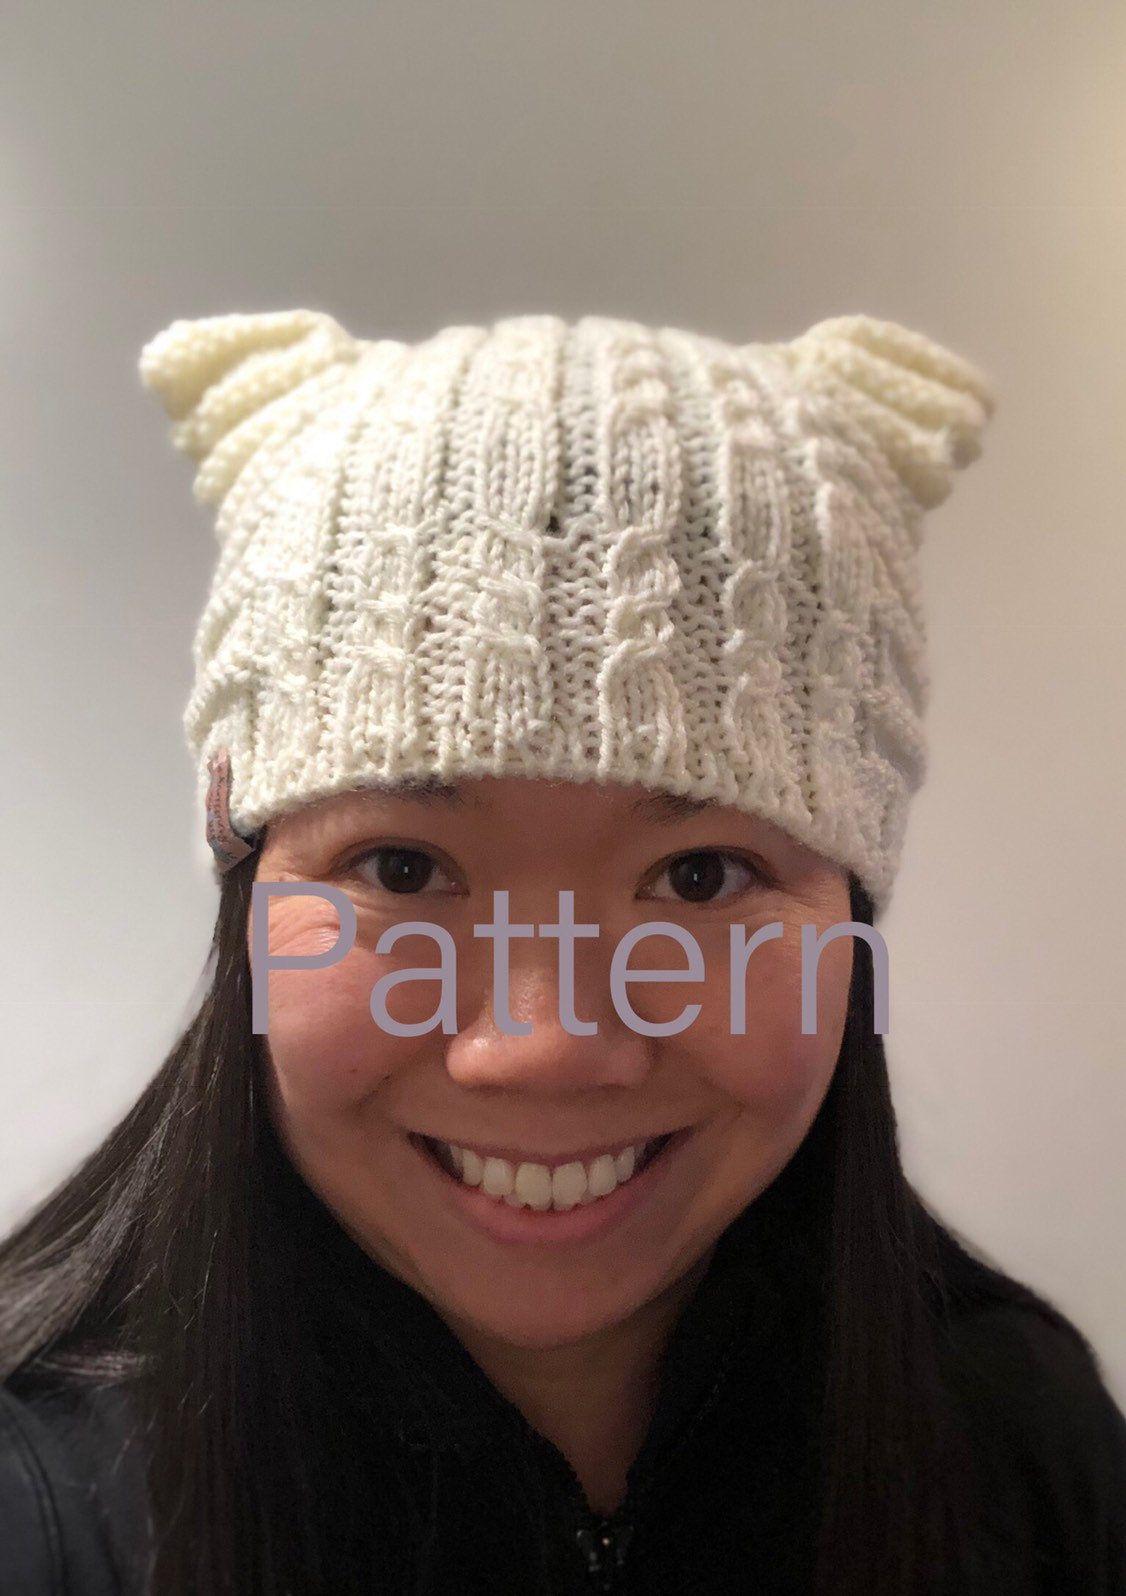 Cat Ear Beanie KNIT PATTERN Mock Cable Hat, Pussyhat Knit ...